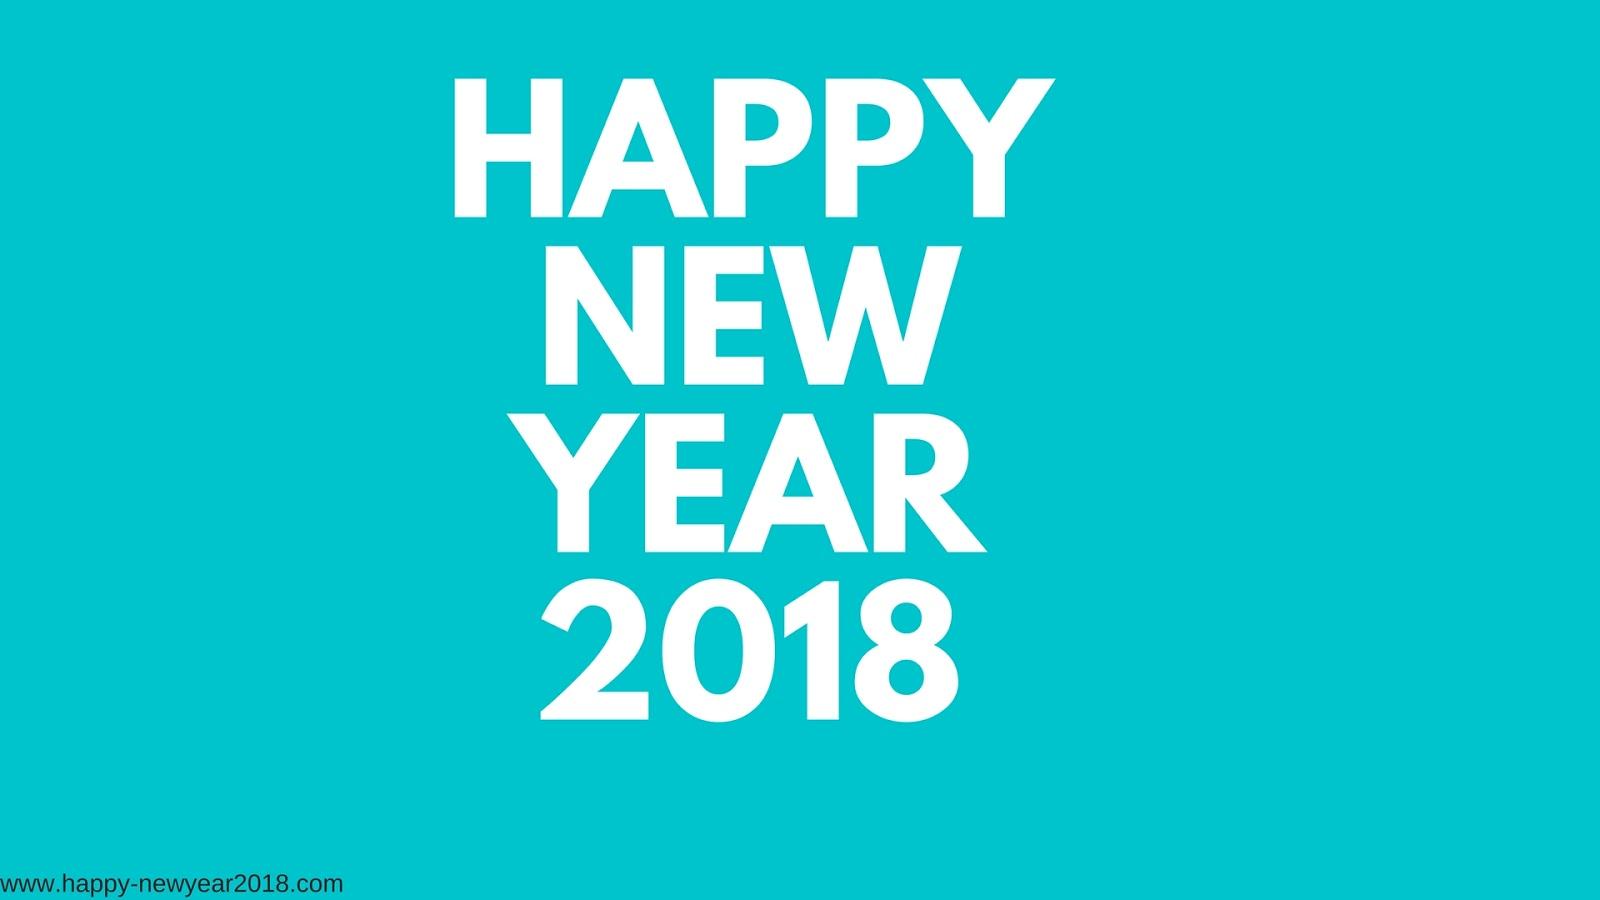 happy new year 2018 happy new year 2018 pictures happy new year 2018 hd wallpaper